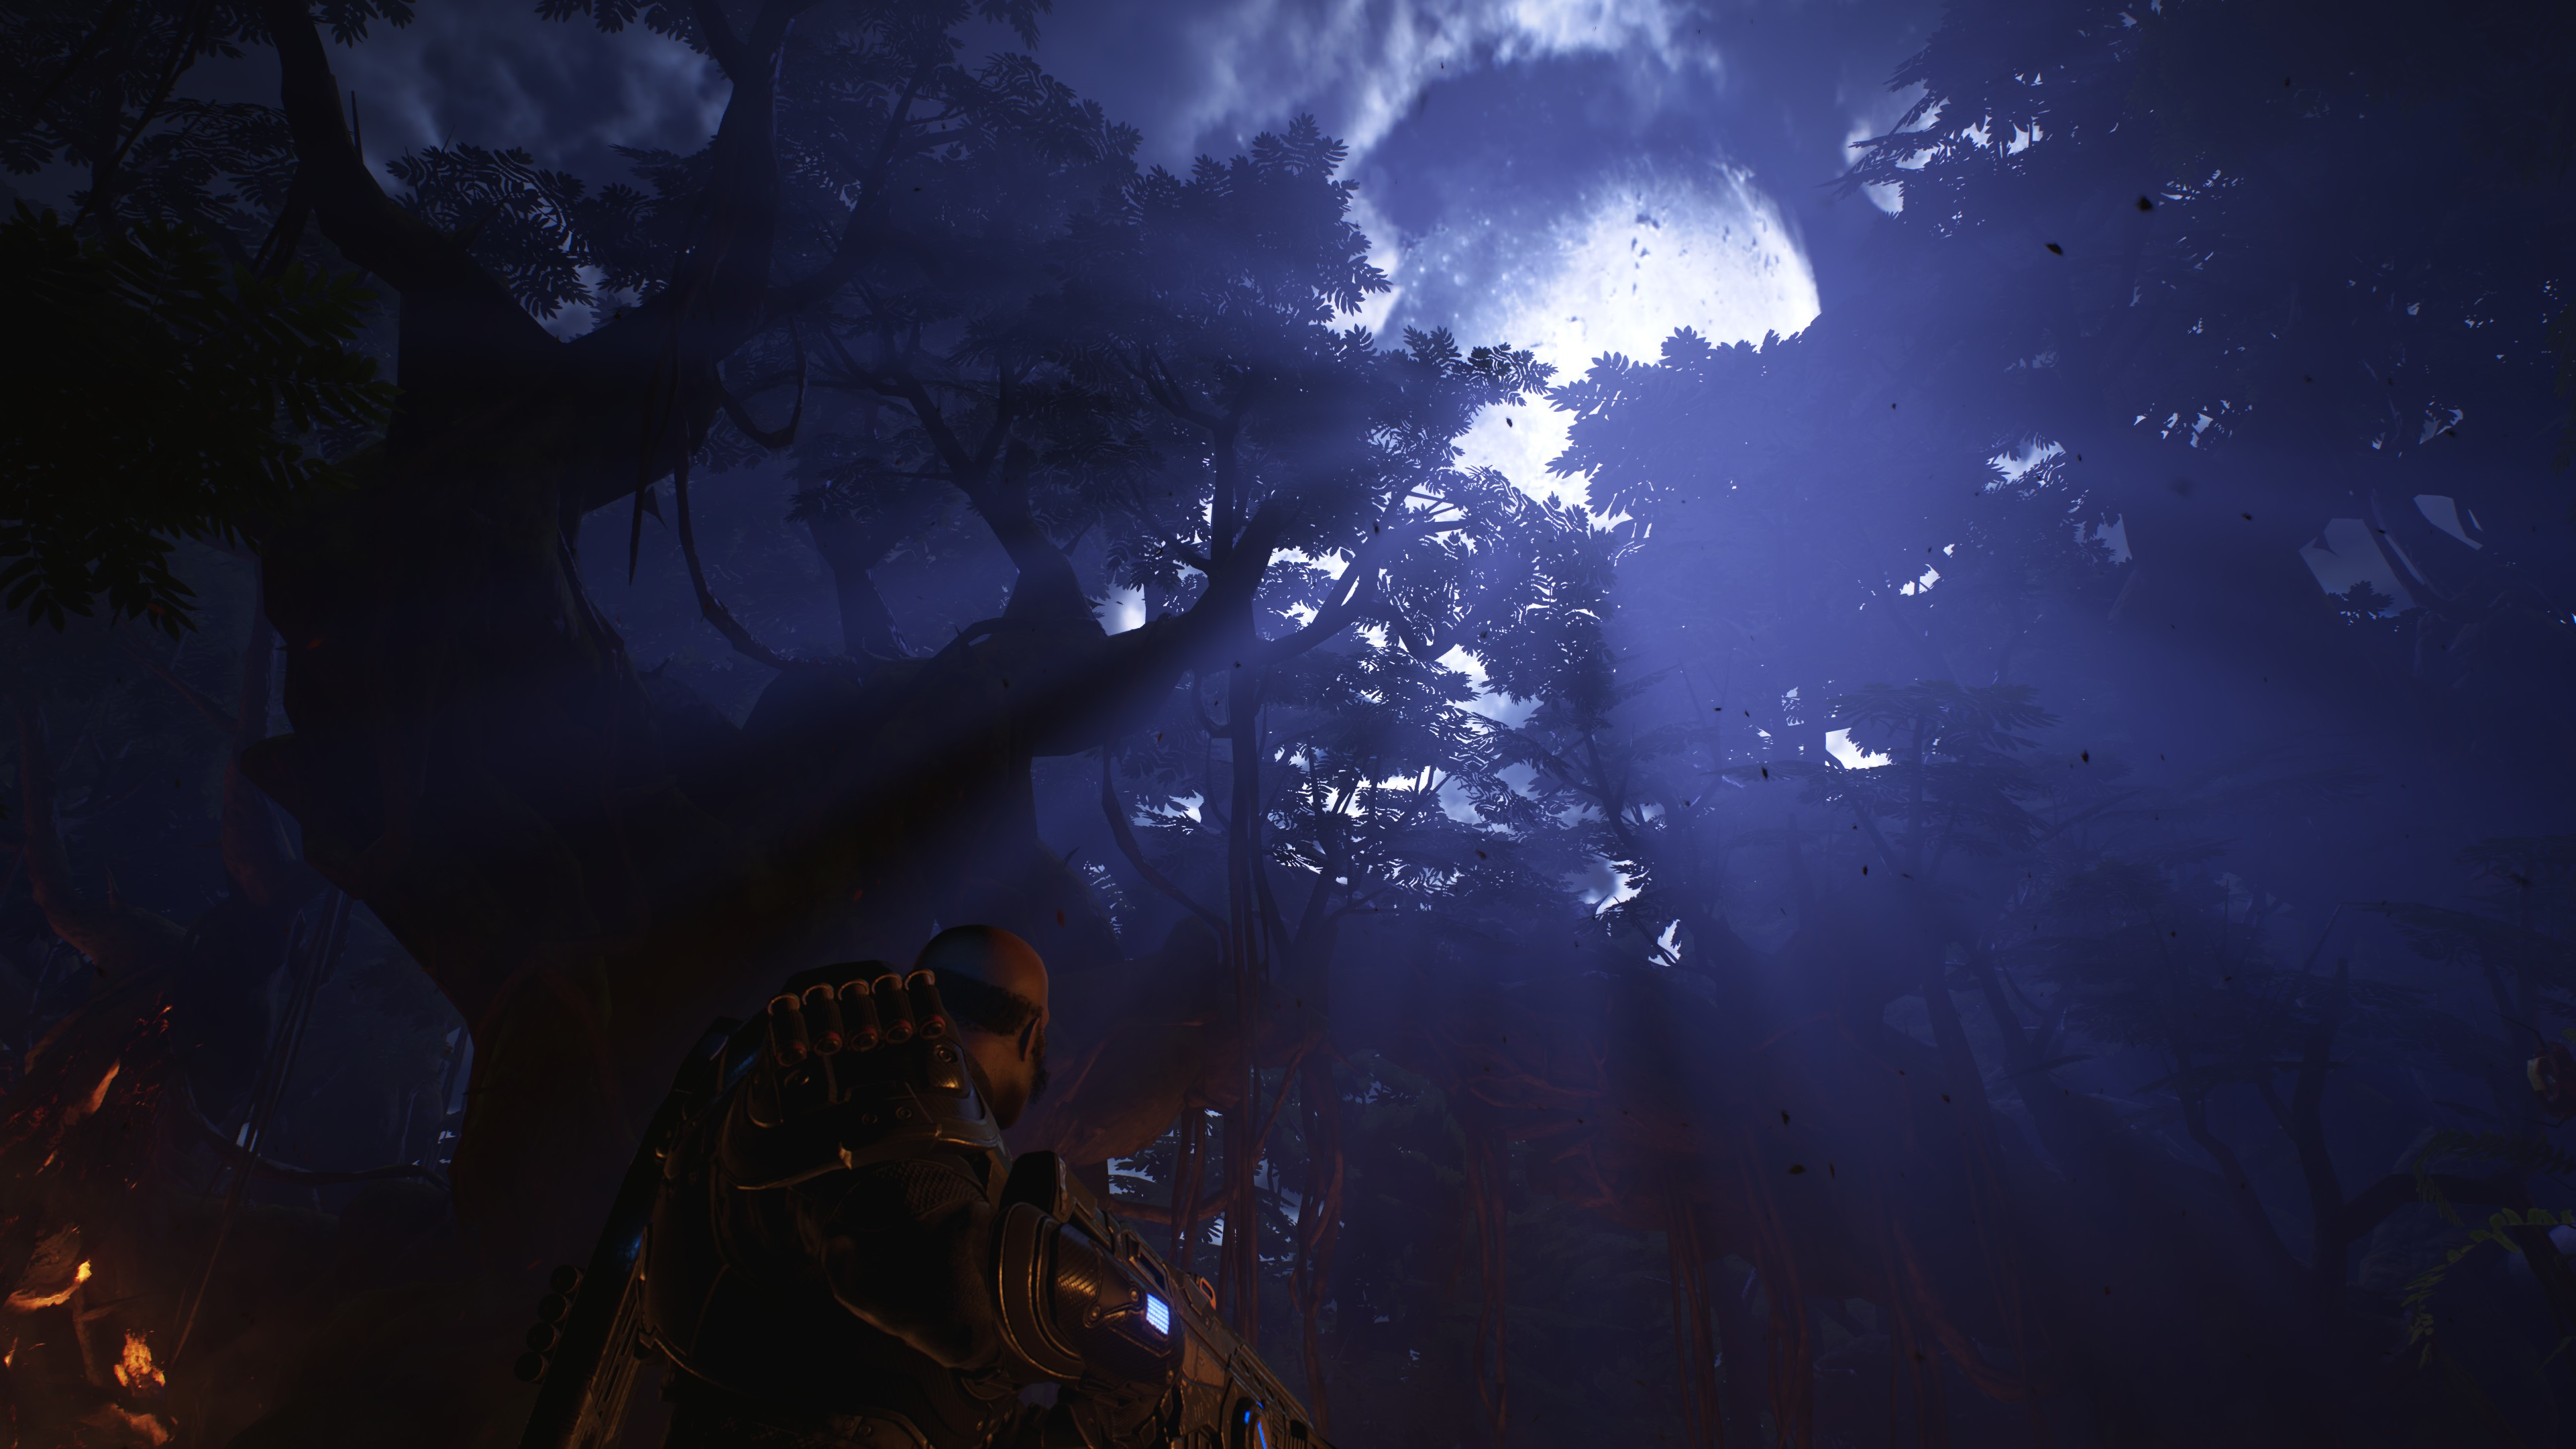 《战争机器5》Hivebusters DLC现已上线 国区70元